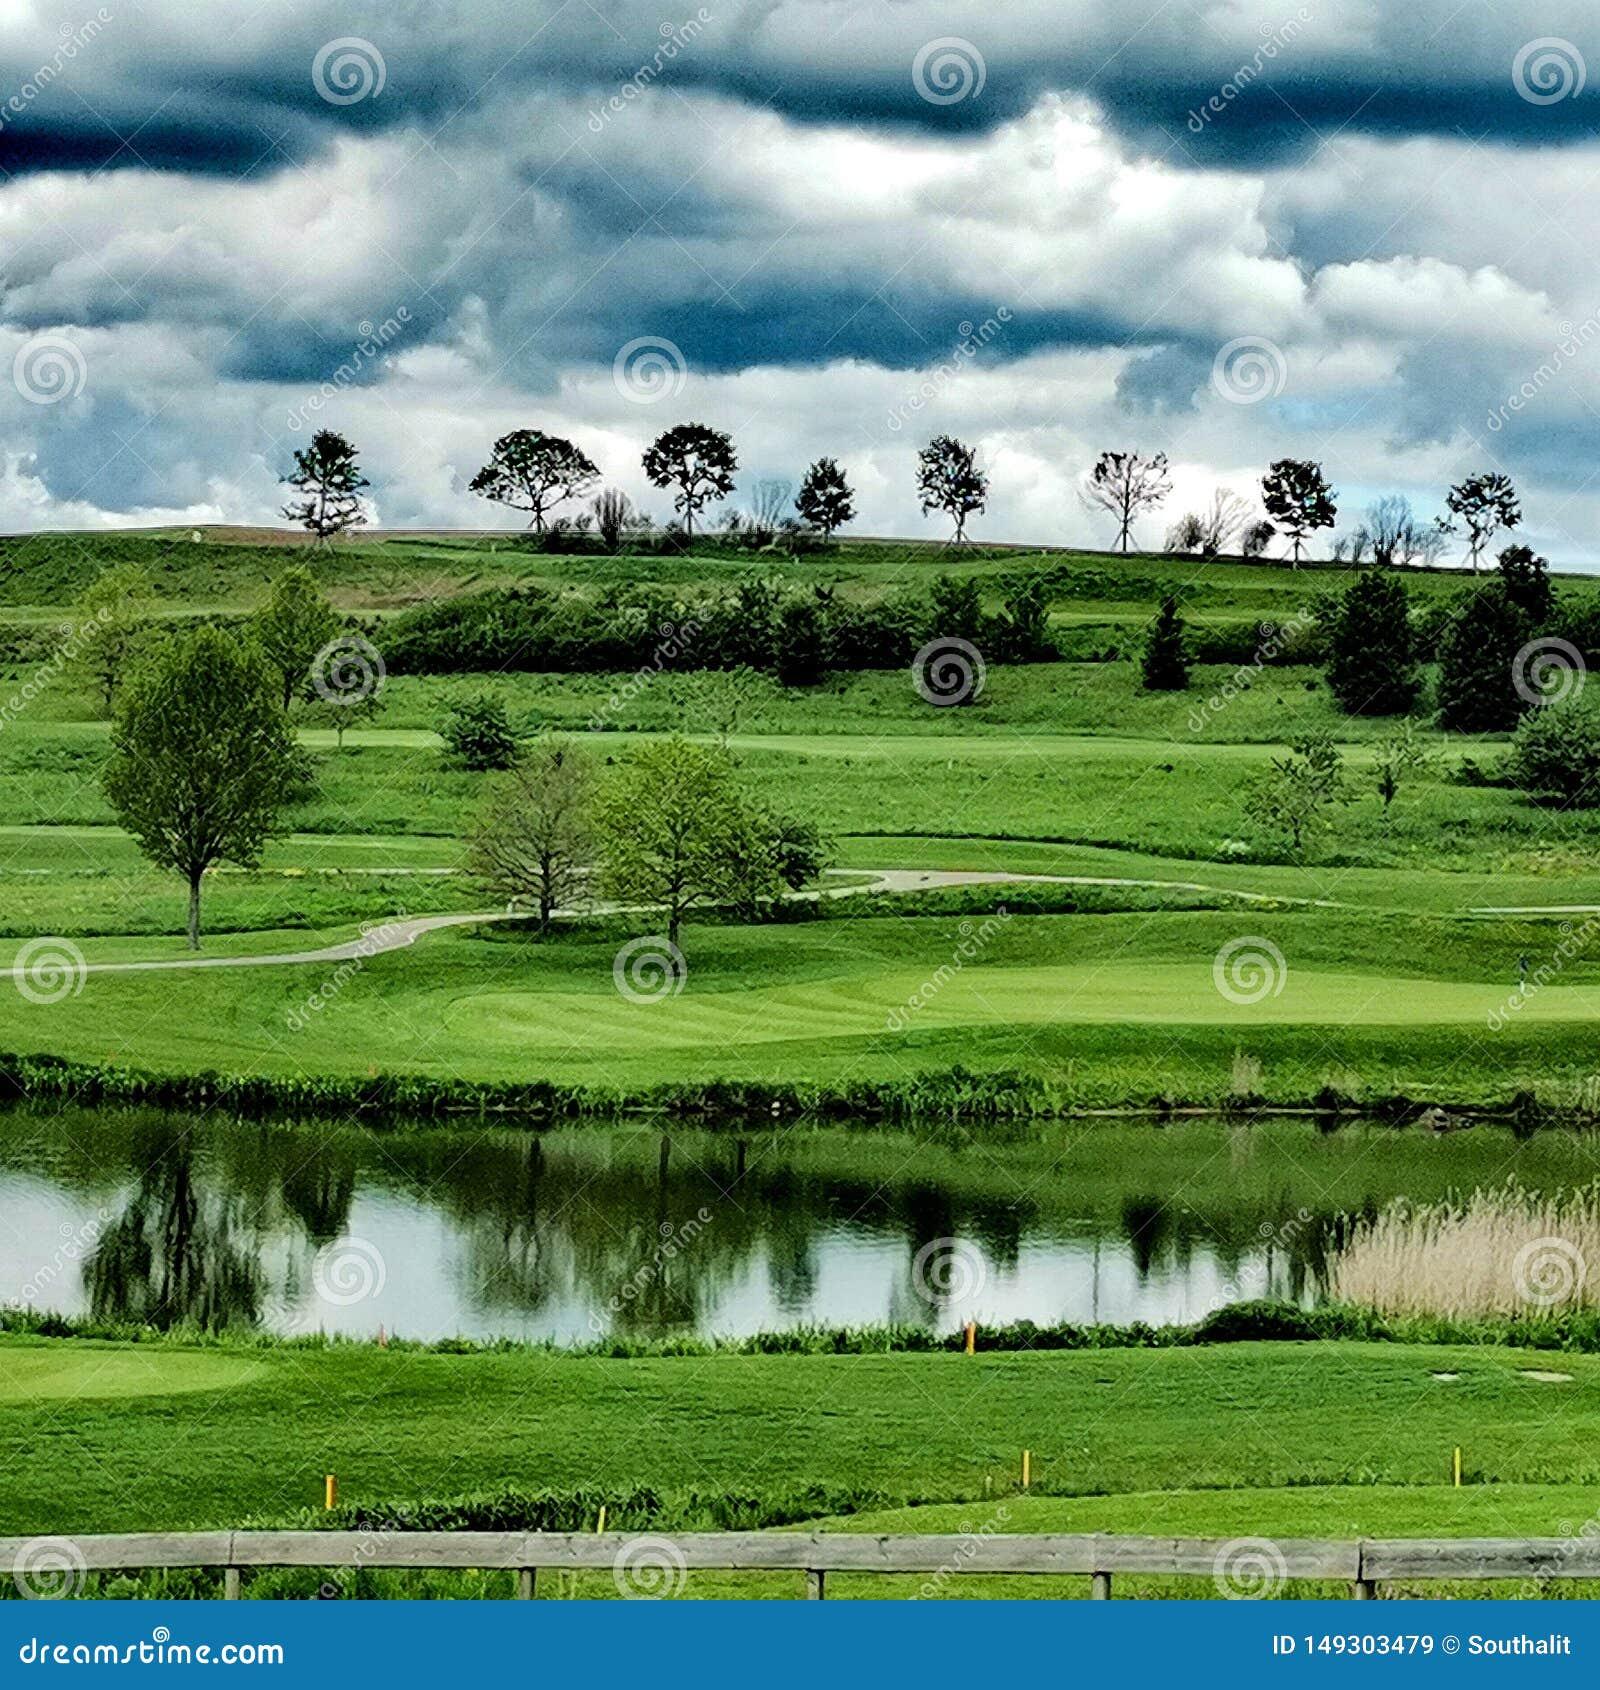 Si rannuvola un campo da golf